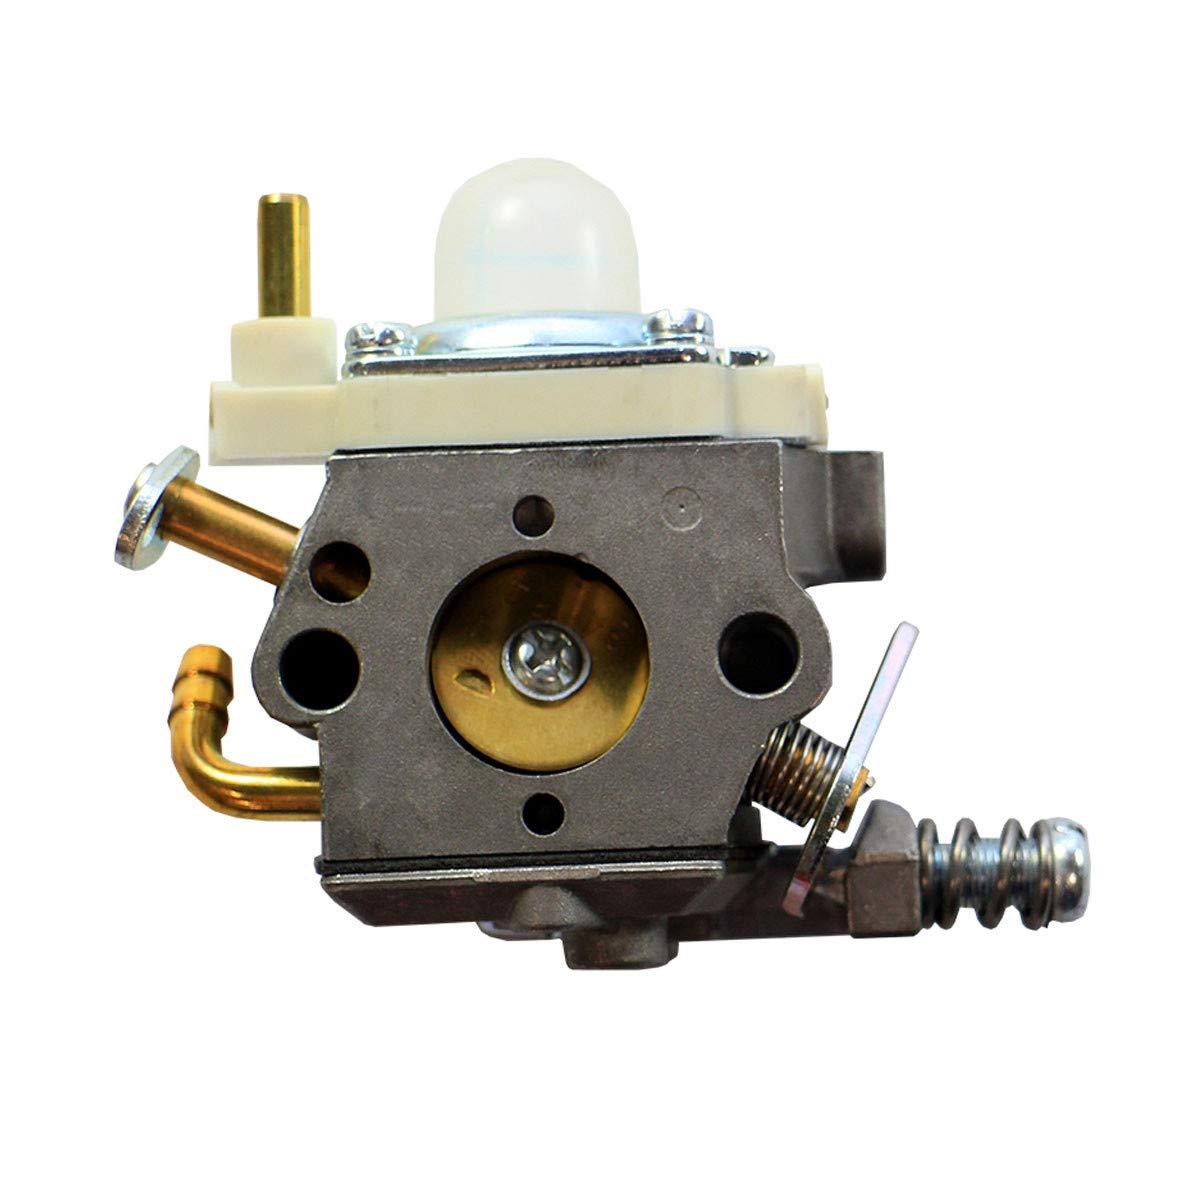 Genuine Echo A021004331 Carburetor WTA-35 Fits Echo PB-580T Backpack Blowers